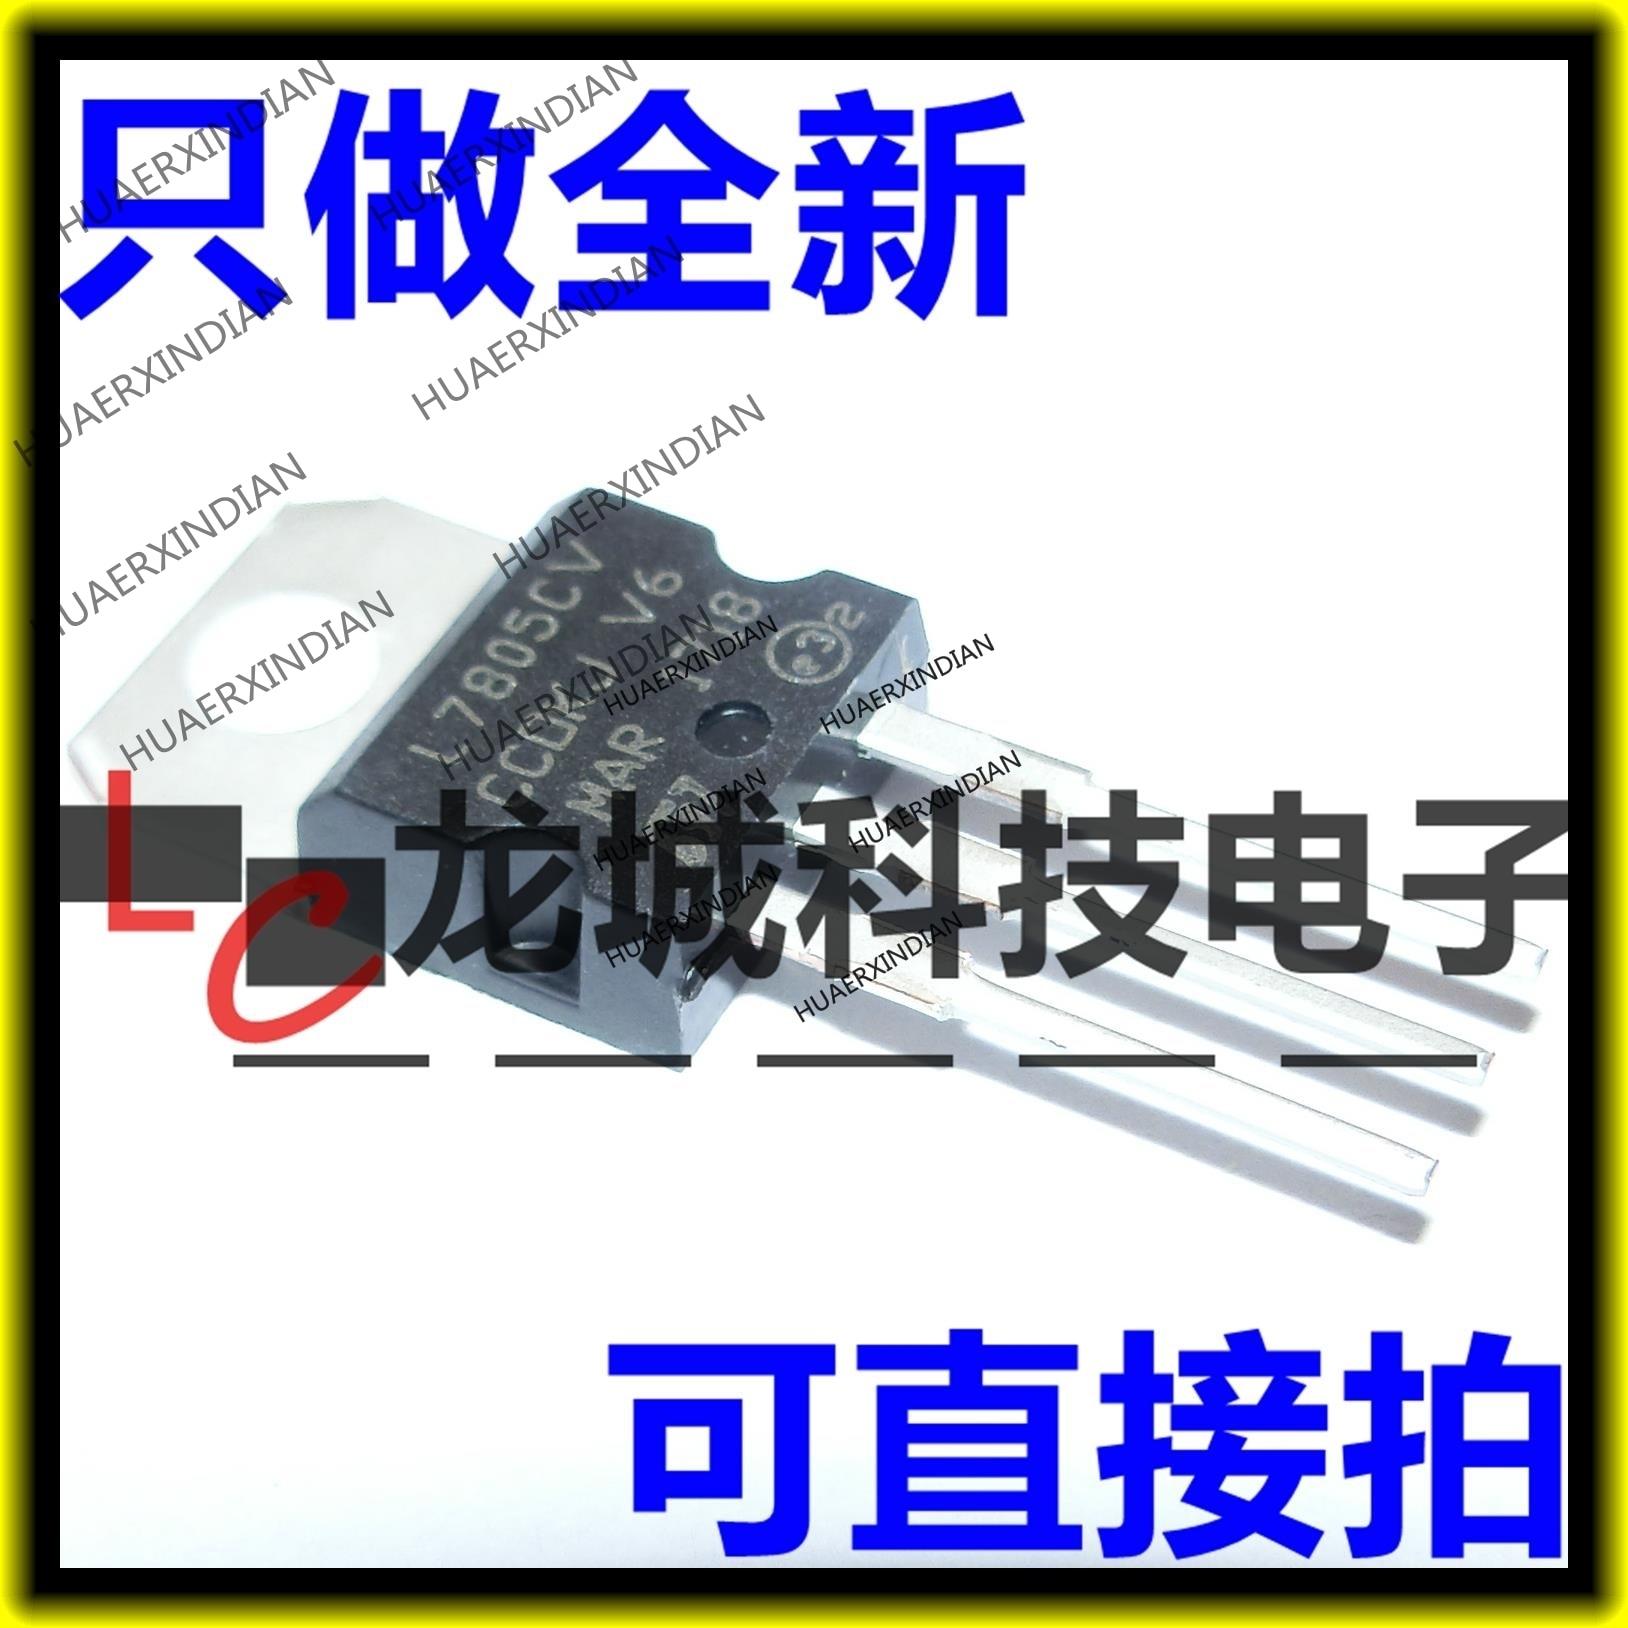 10 unids/lote nueva L7805CV 1.2A ST-220 5V 7805 productos en stock